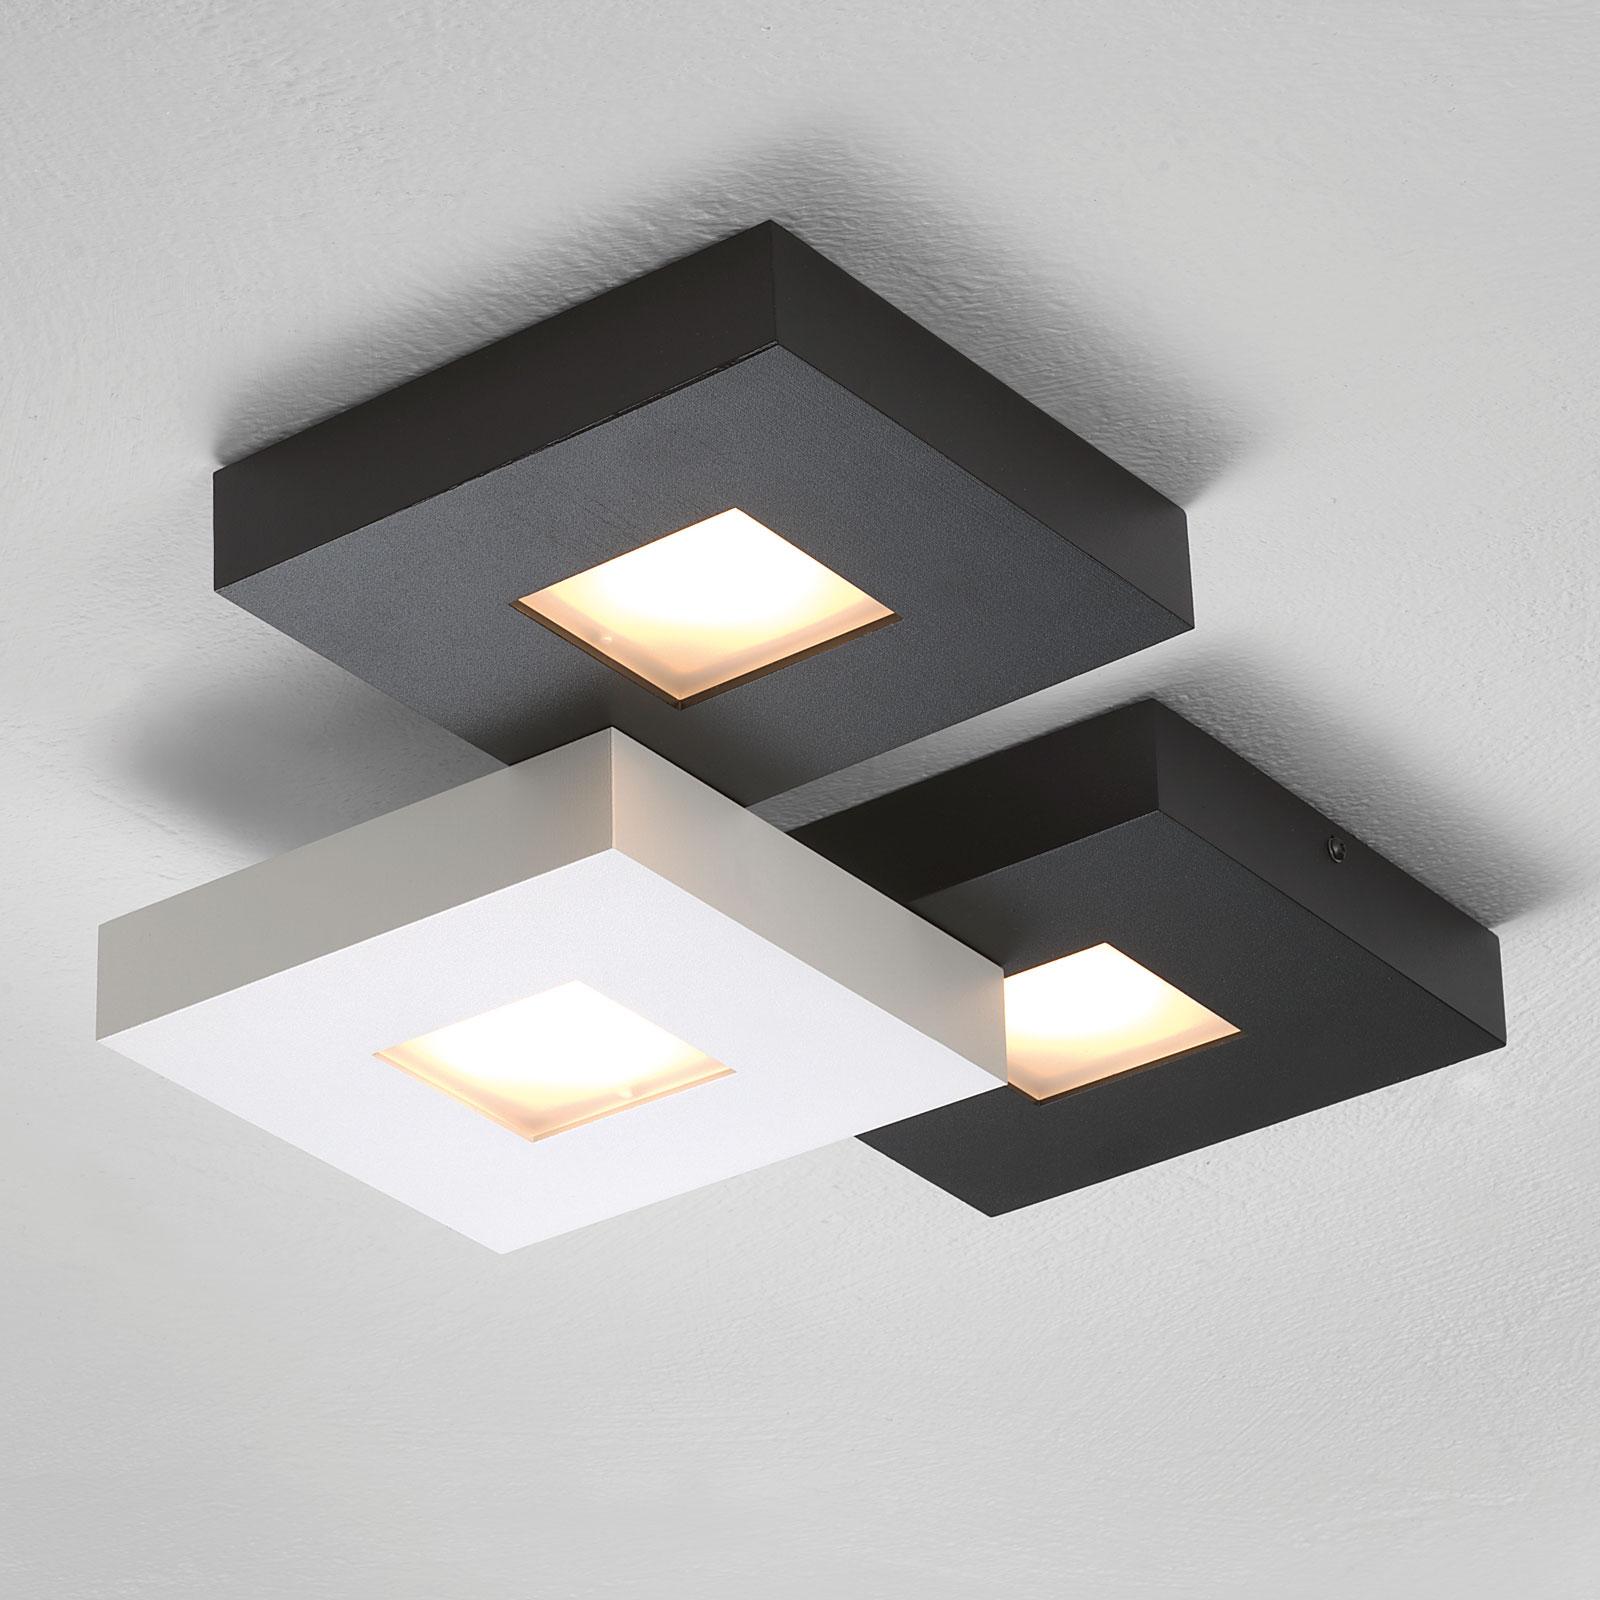 Lámpara de techo LED Cubus, 3 luces, blanco-negro